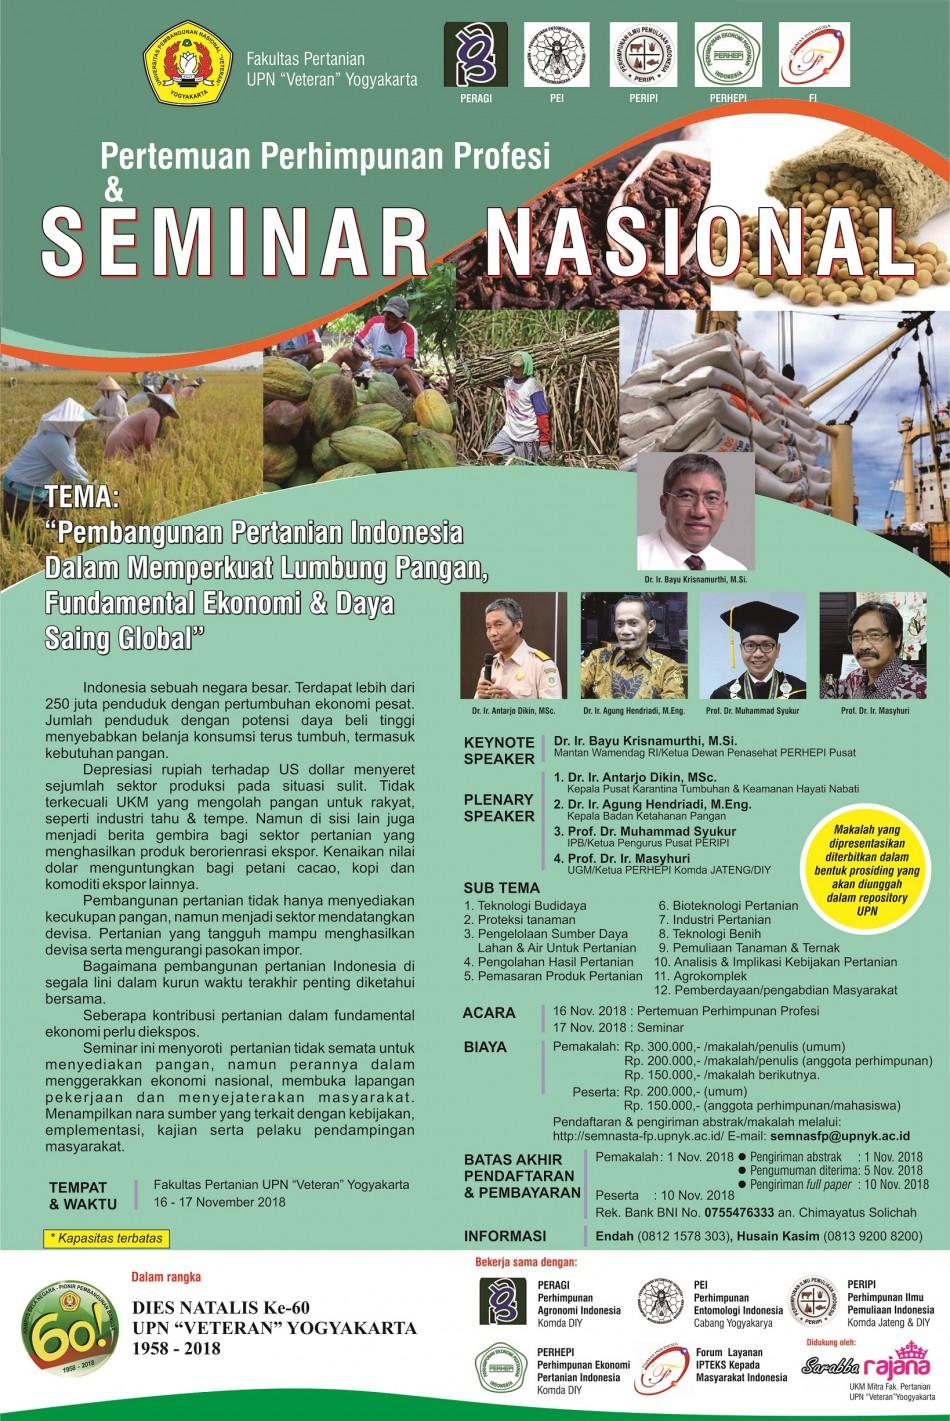 image Seminar Nasional 2018 FP UPNVY